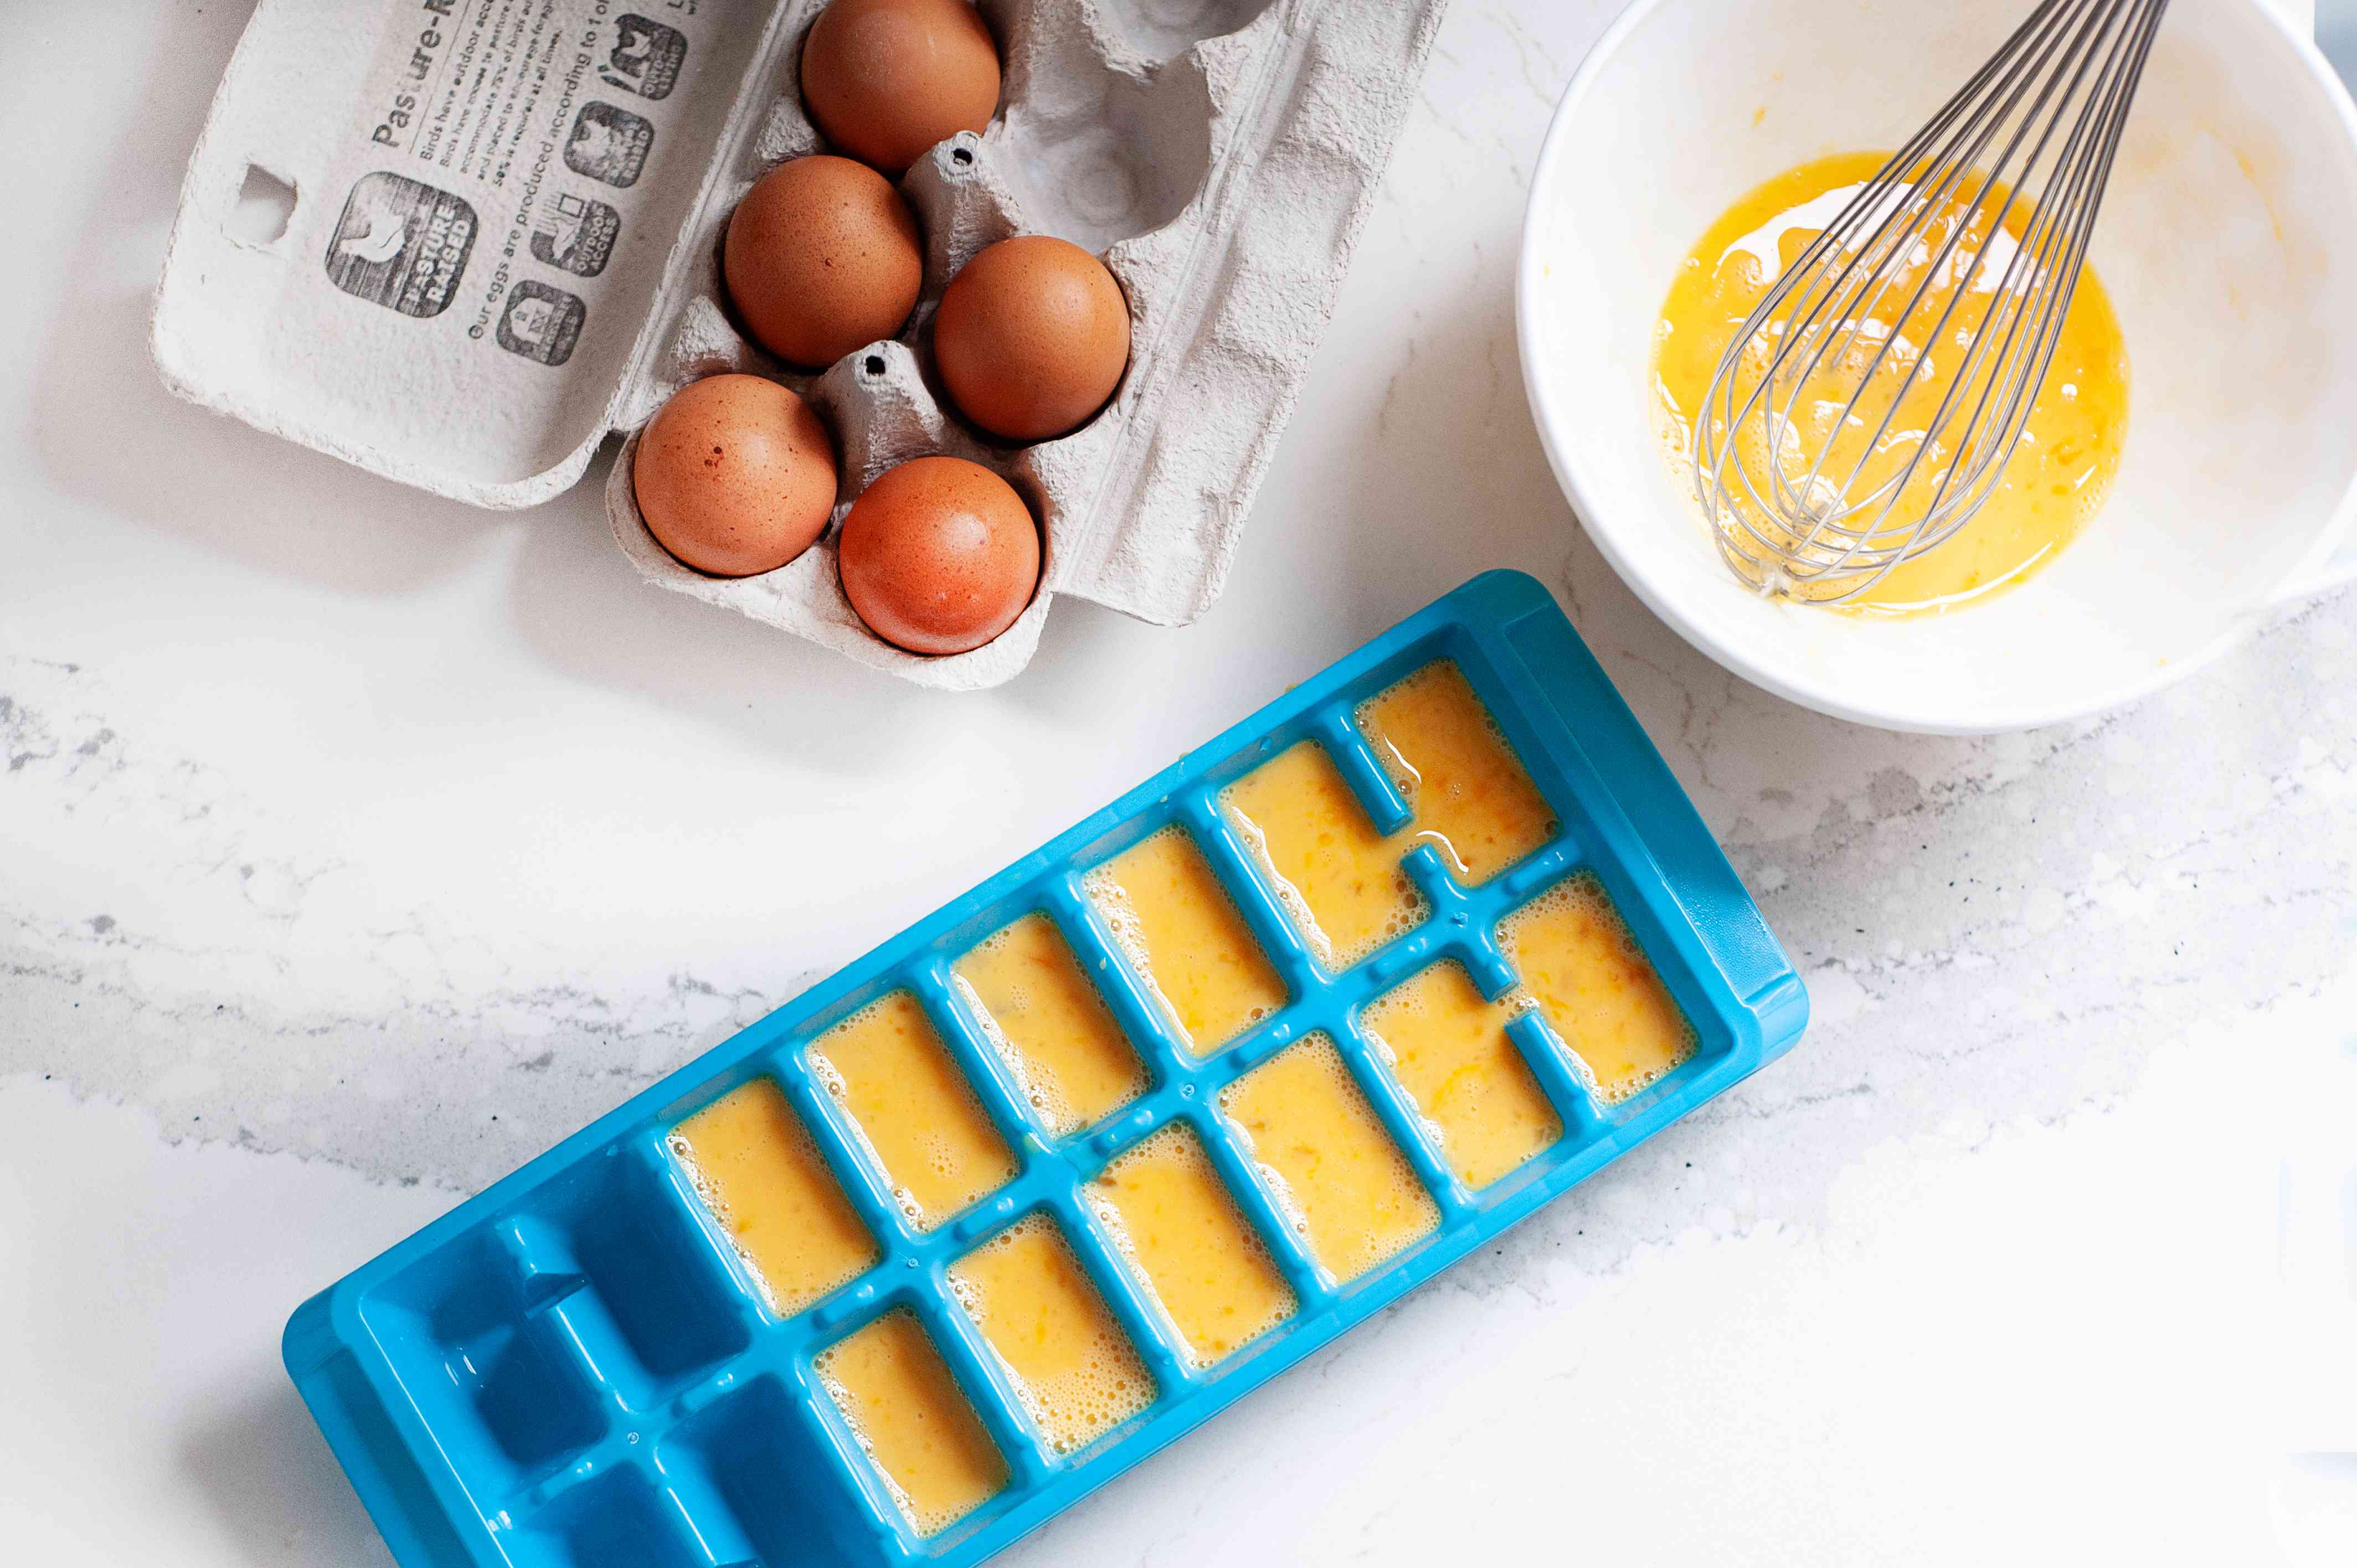 Eggs frozen in an ice cube tray.